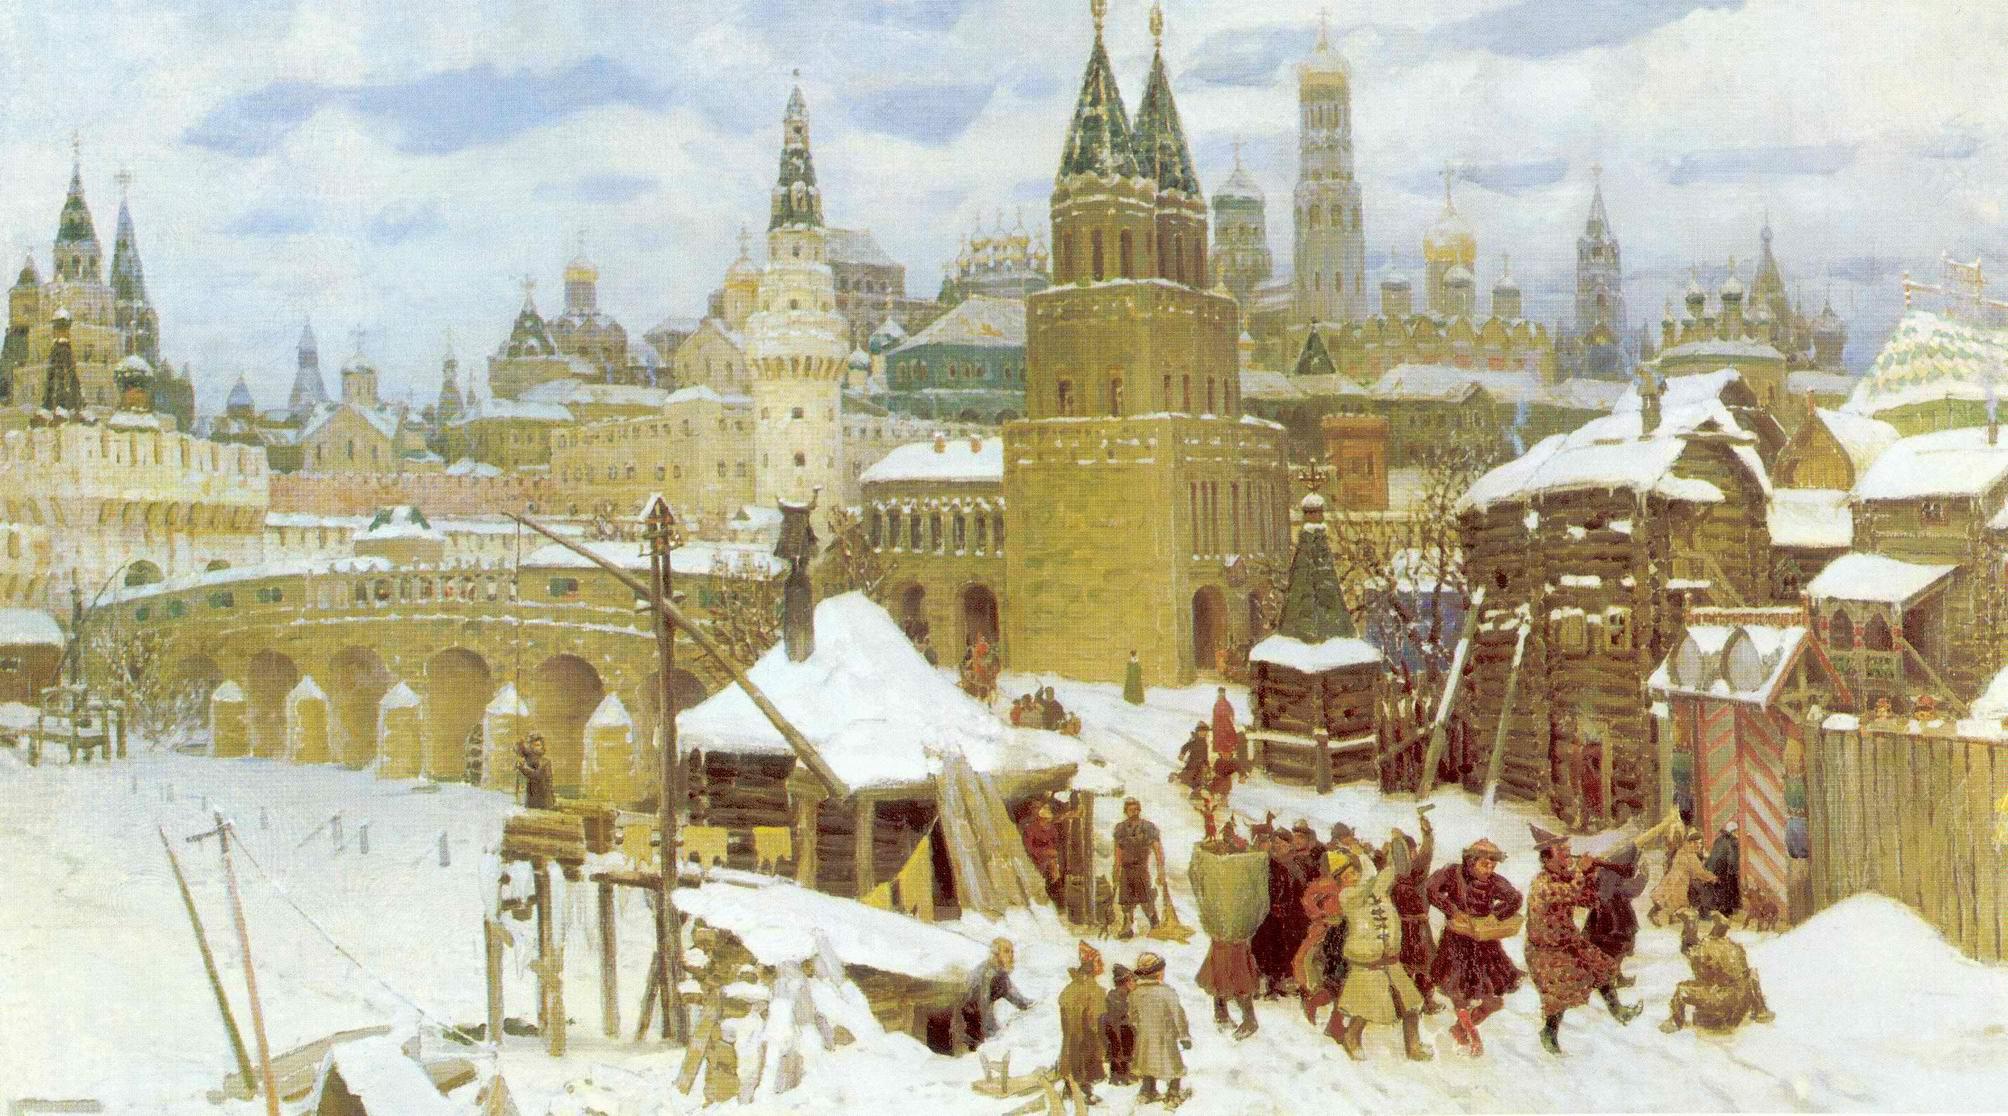 Всехсвятский каменный мост. Москва конца XVII века, Васнецов Аполлинарий Михайлович